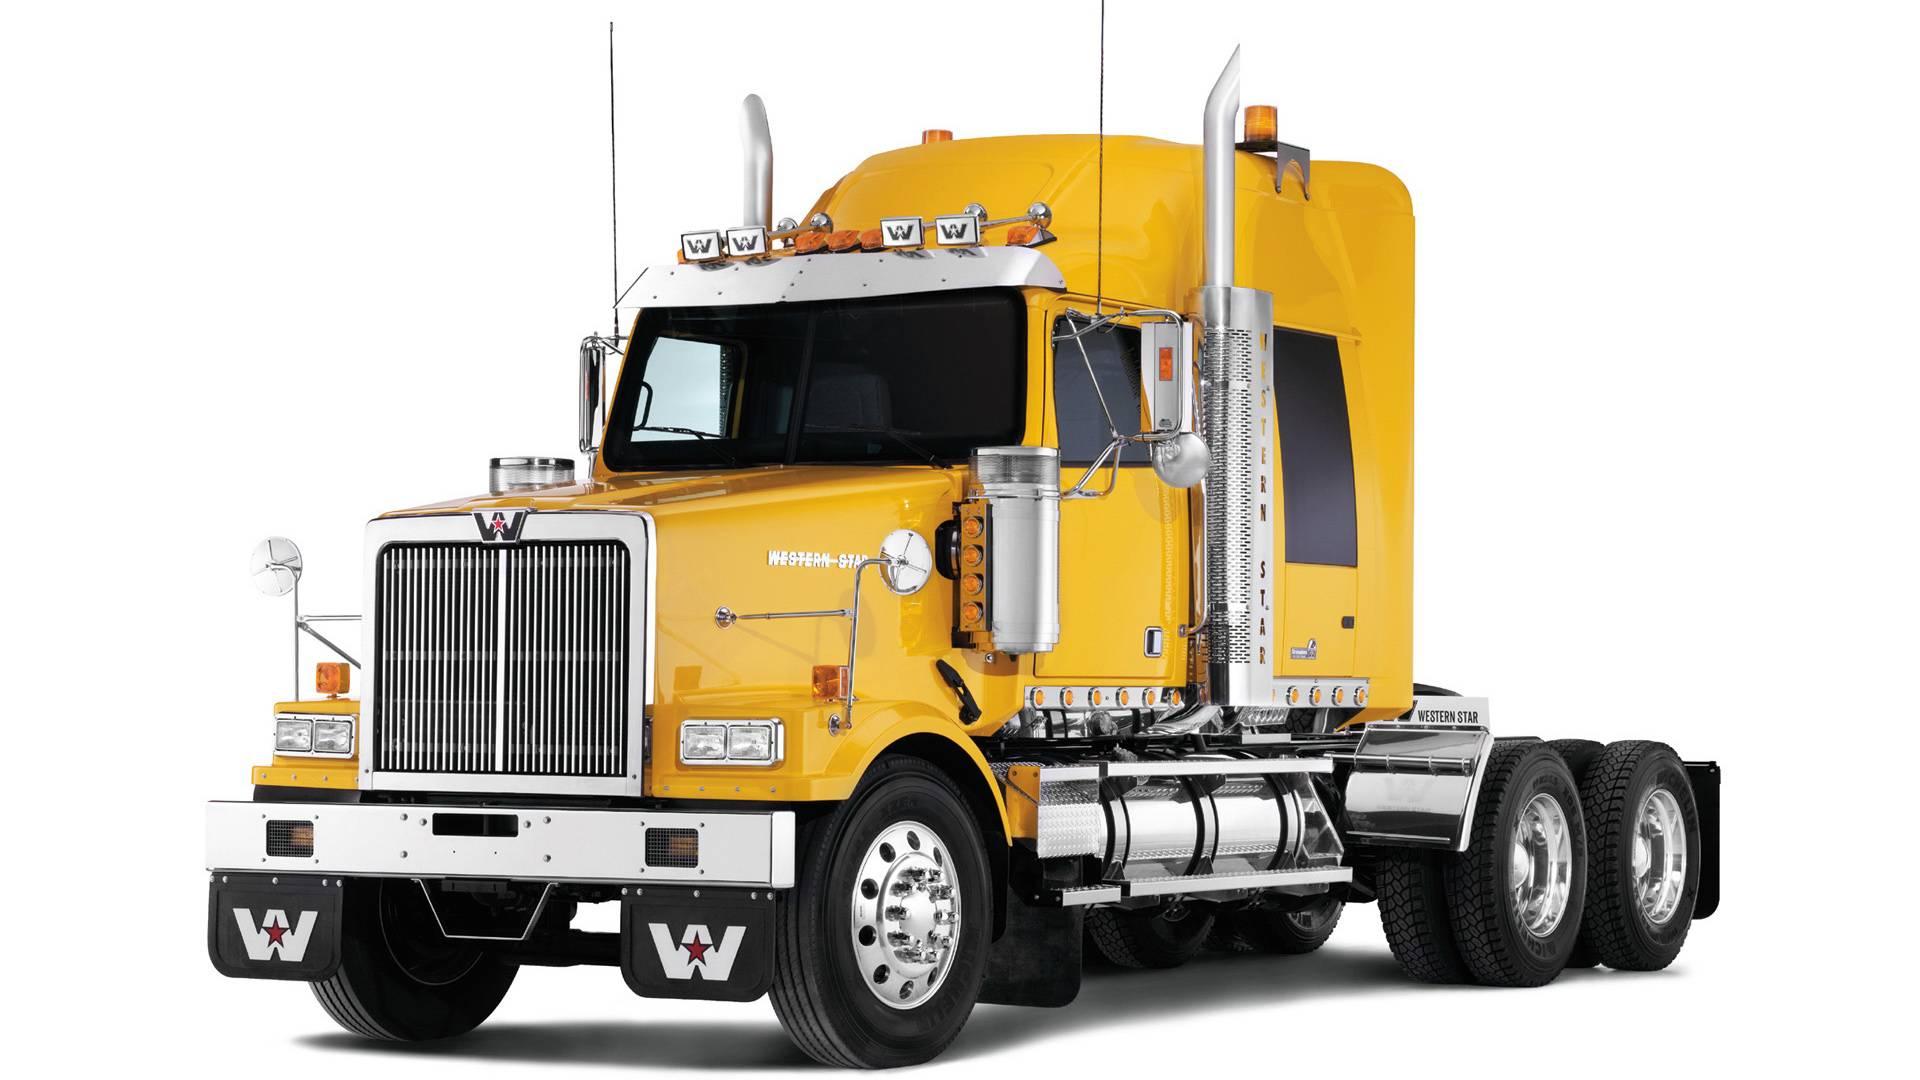 Best Dodge Trucks Original Yellow Western Wallpaper, HQ - Lorry PNG HD